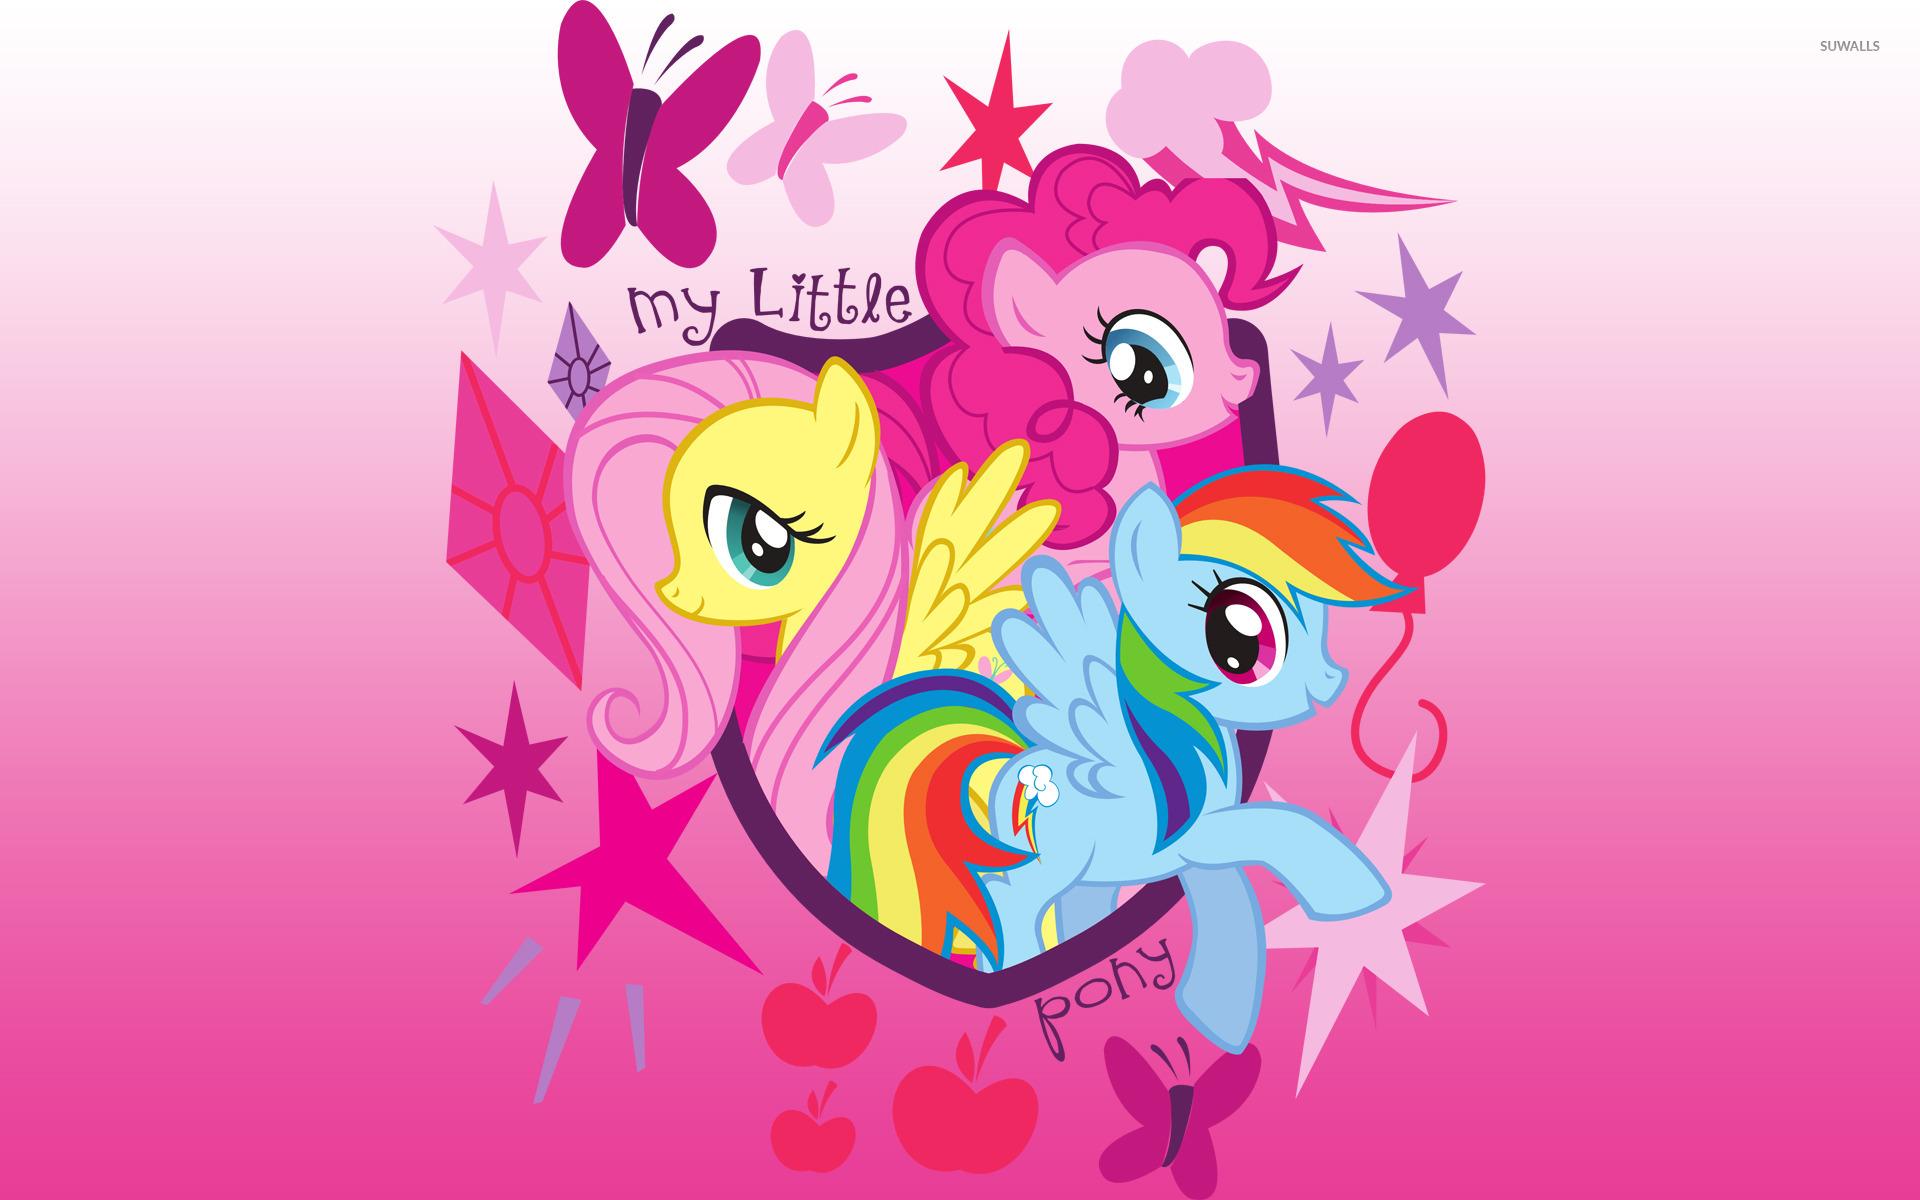 My Little Pony Friendship is Magic [4] wallpaper - Cartoon ...